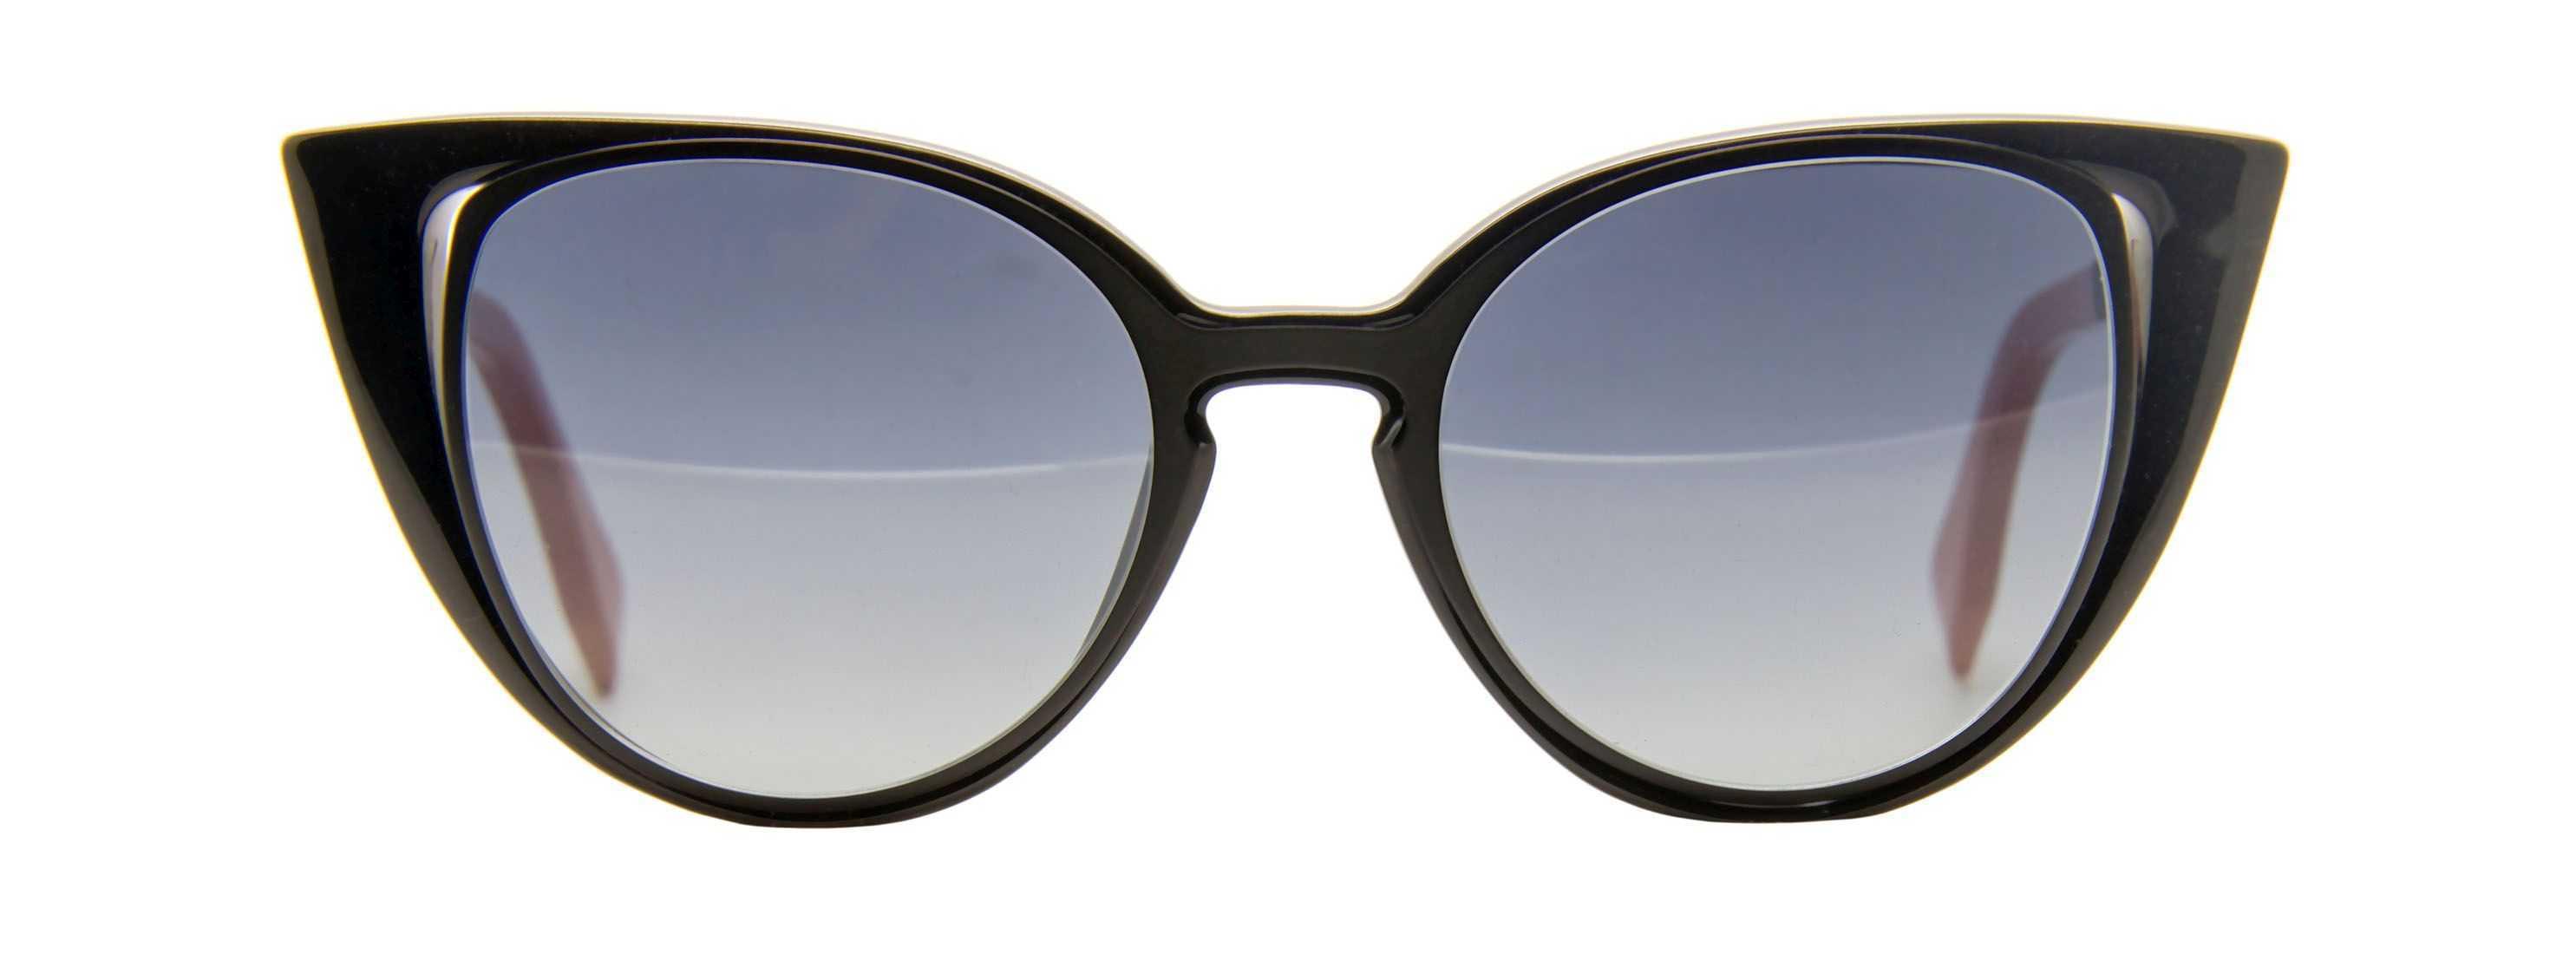 Fendi sunglasses 0136 Ny1hd 01 2970x1100 Shop Desk